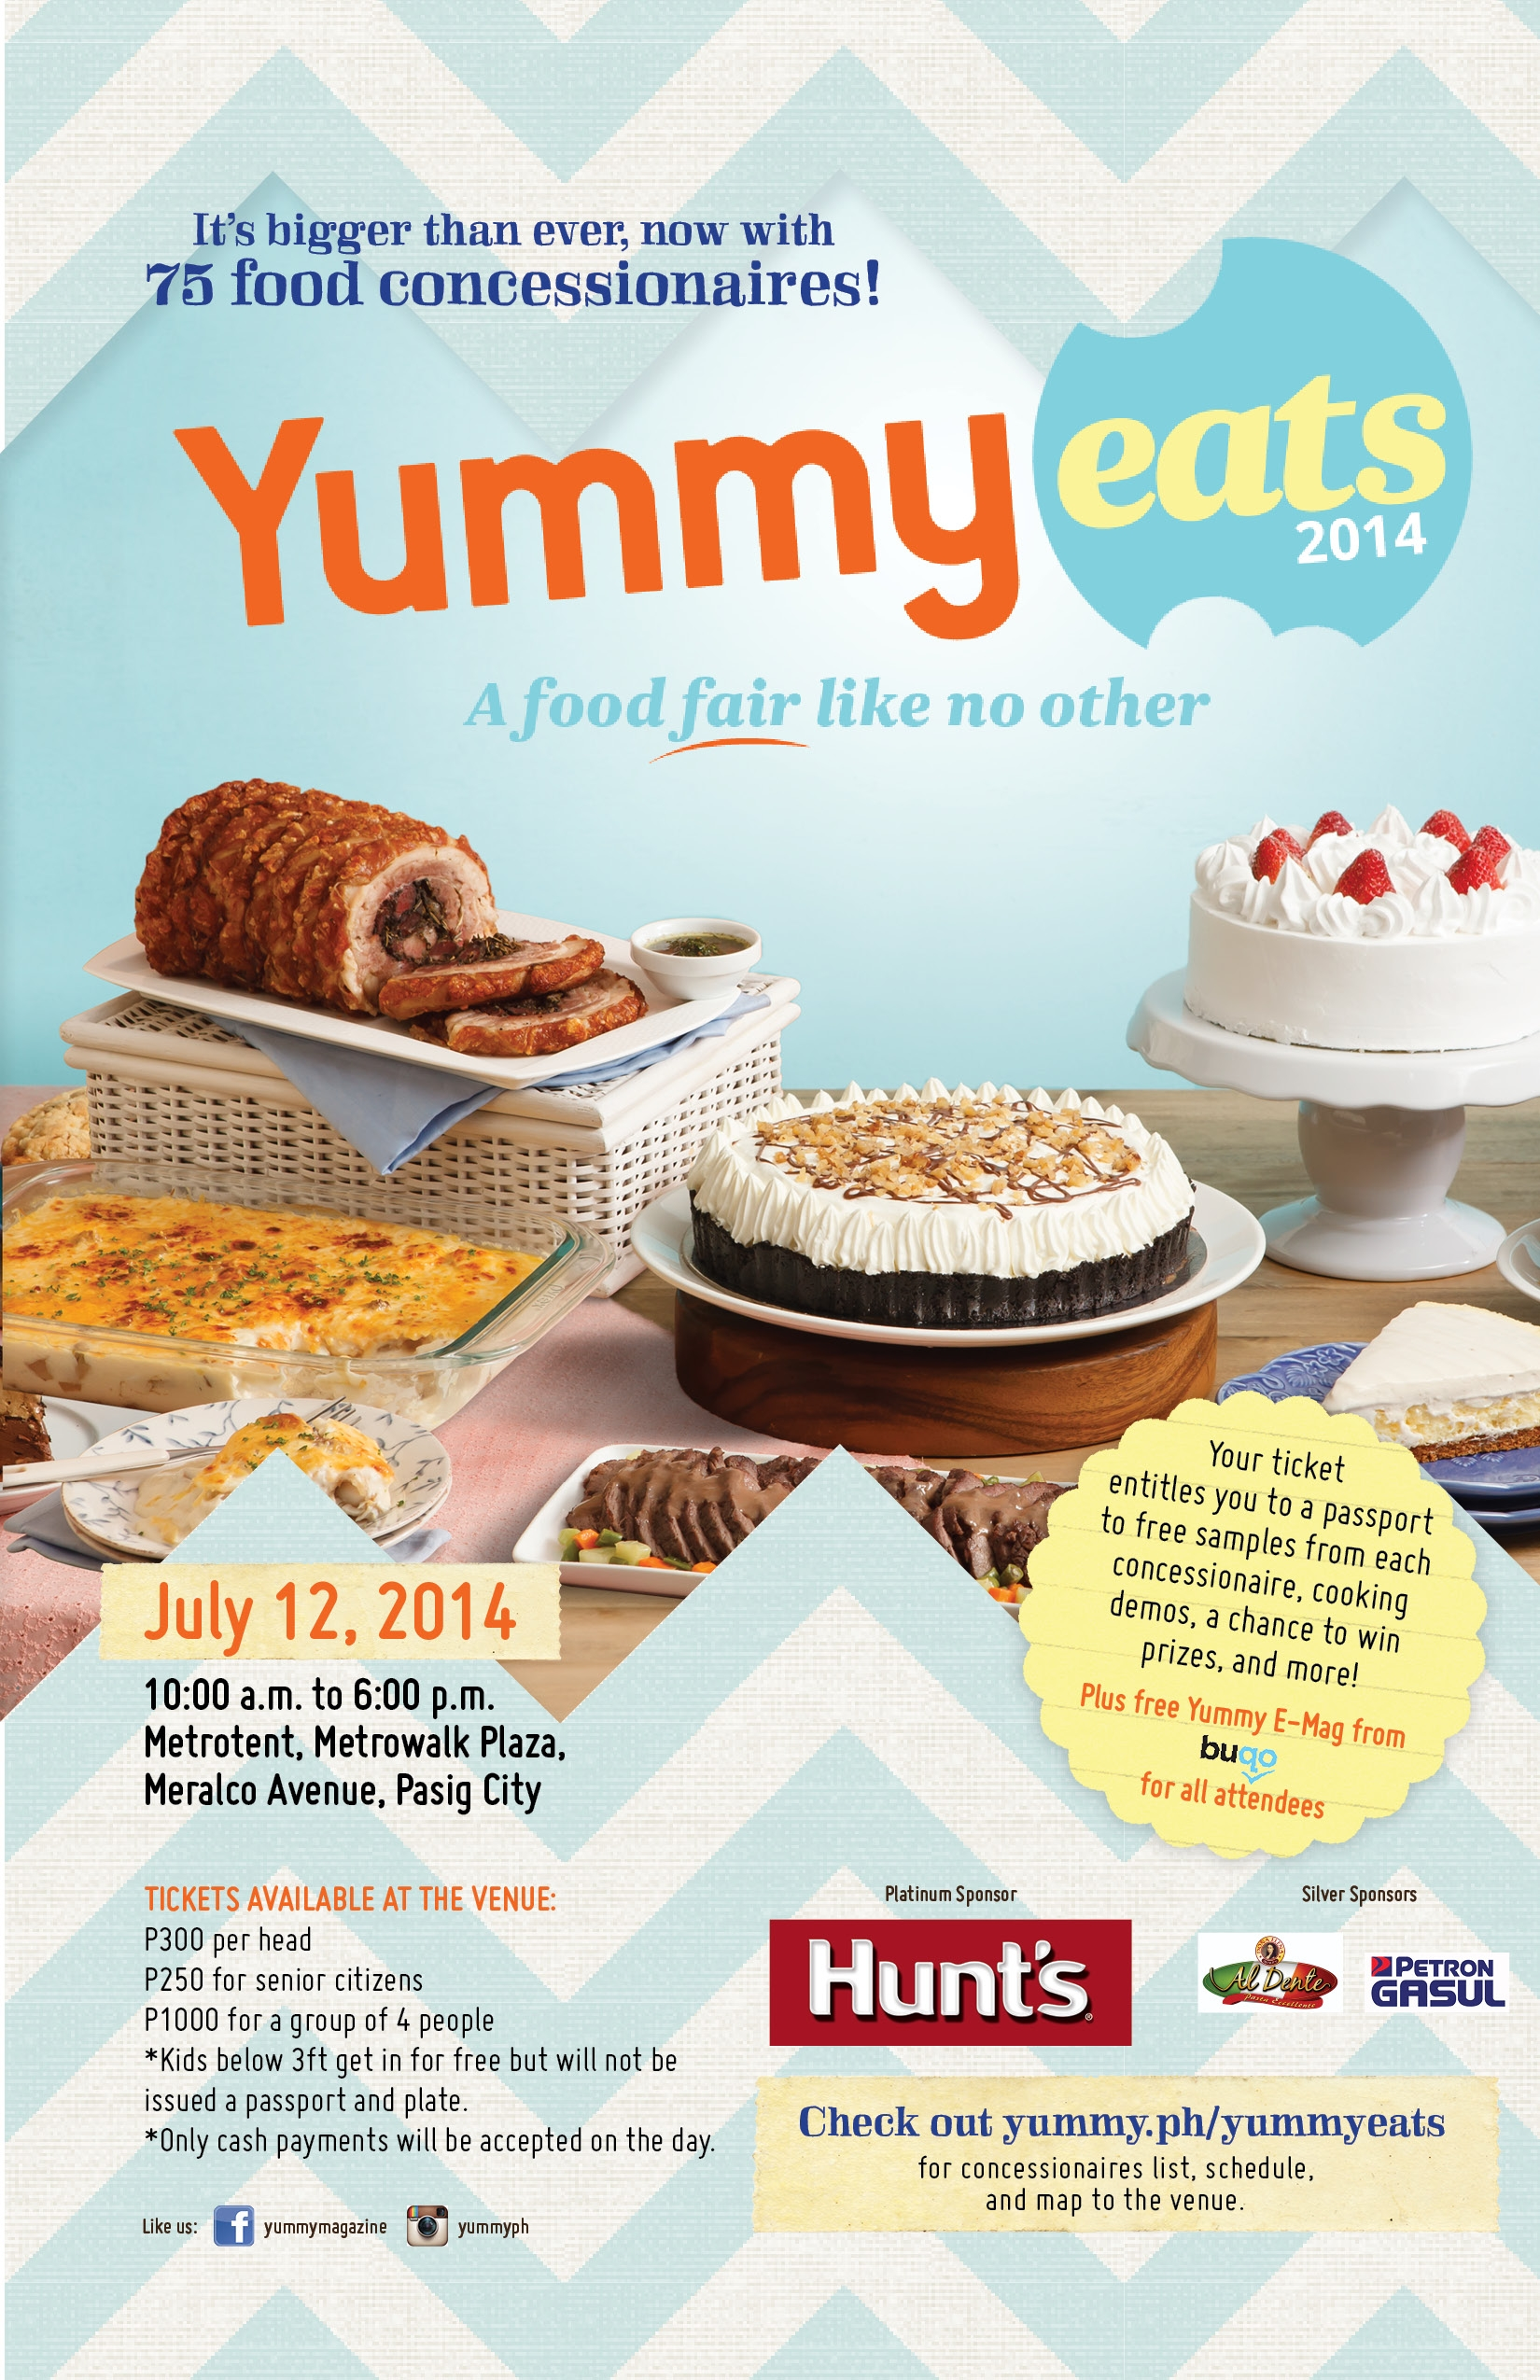 yummy_eats_poster.JPG